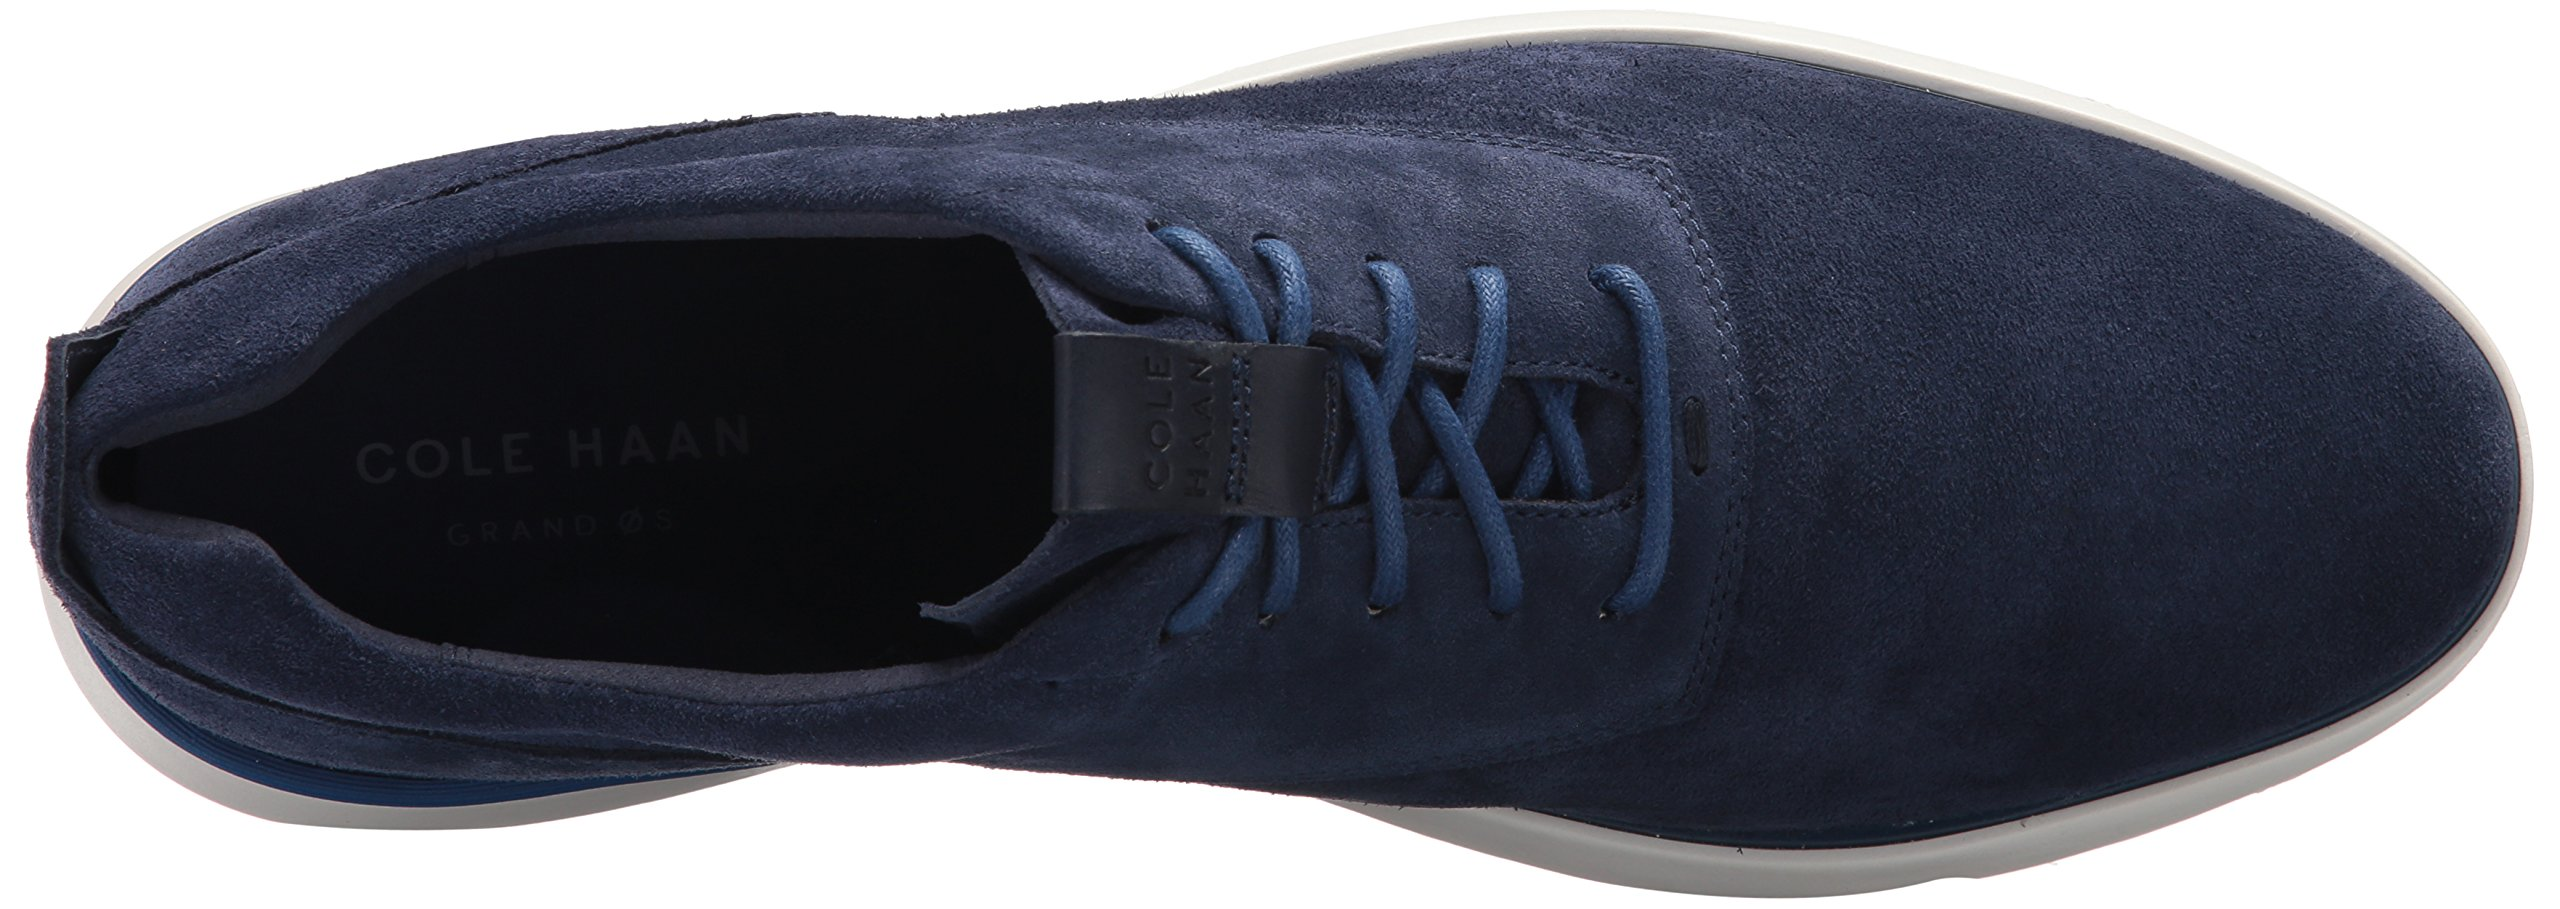 Cole Haan Men's Grand Horizon Oxford II, Marine Blue Suede/Ivory, 11.5 Medium US by Cole Haan (Image #8)